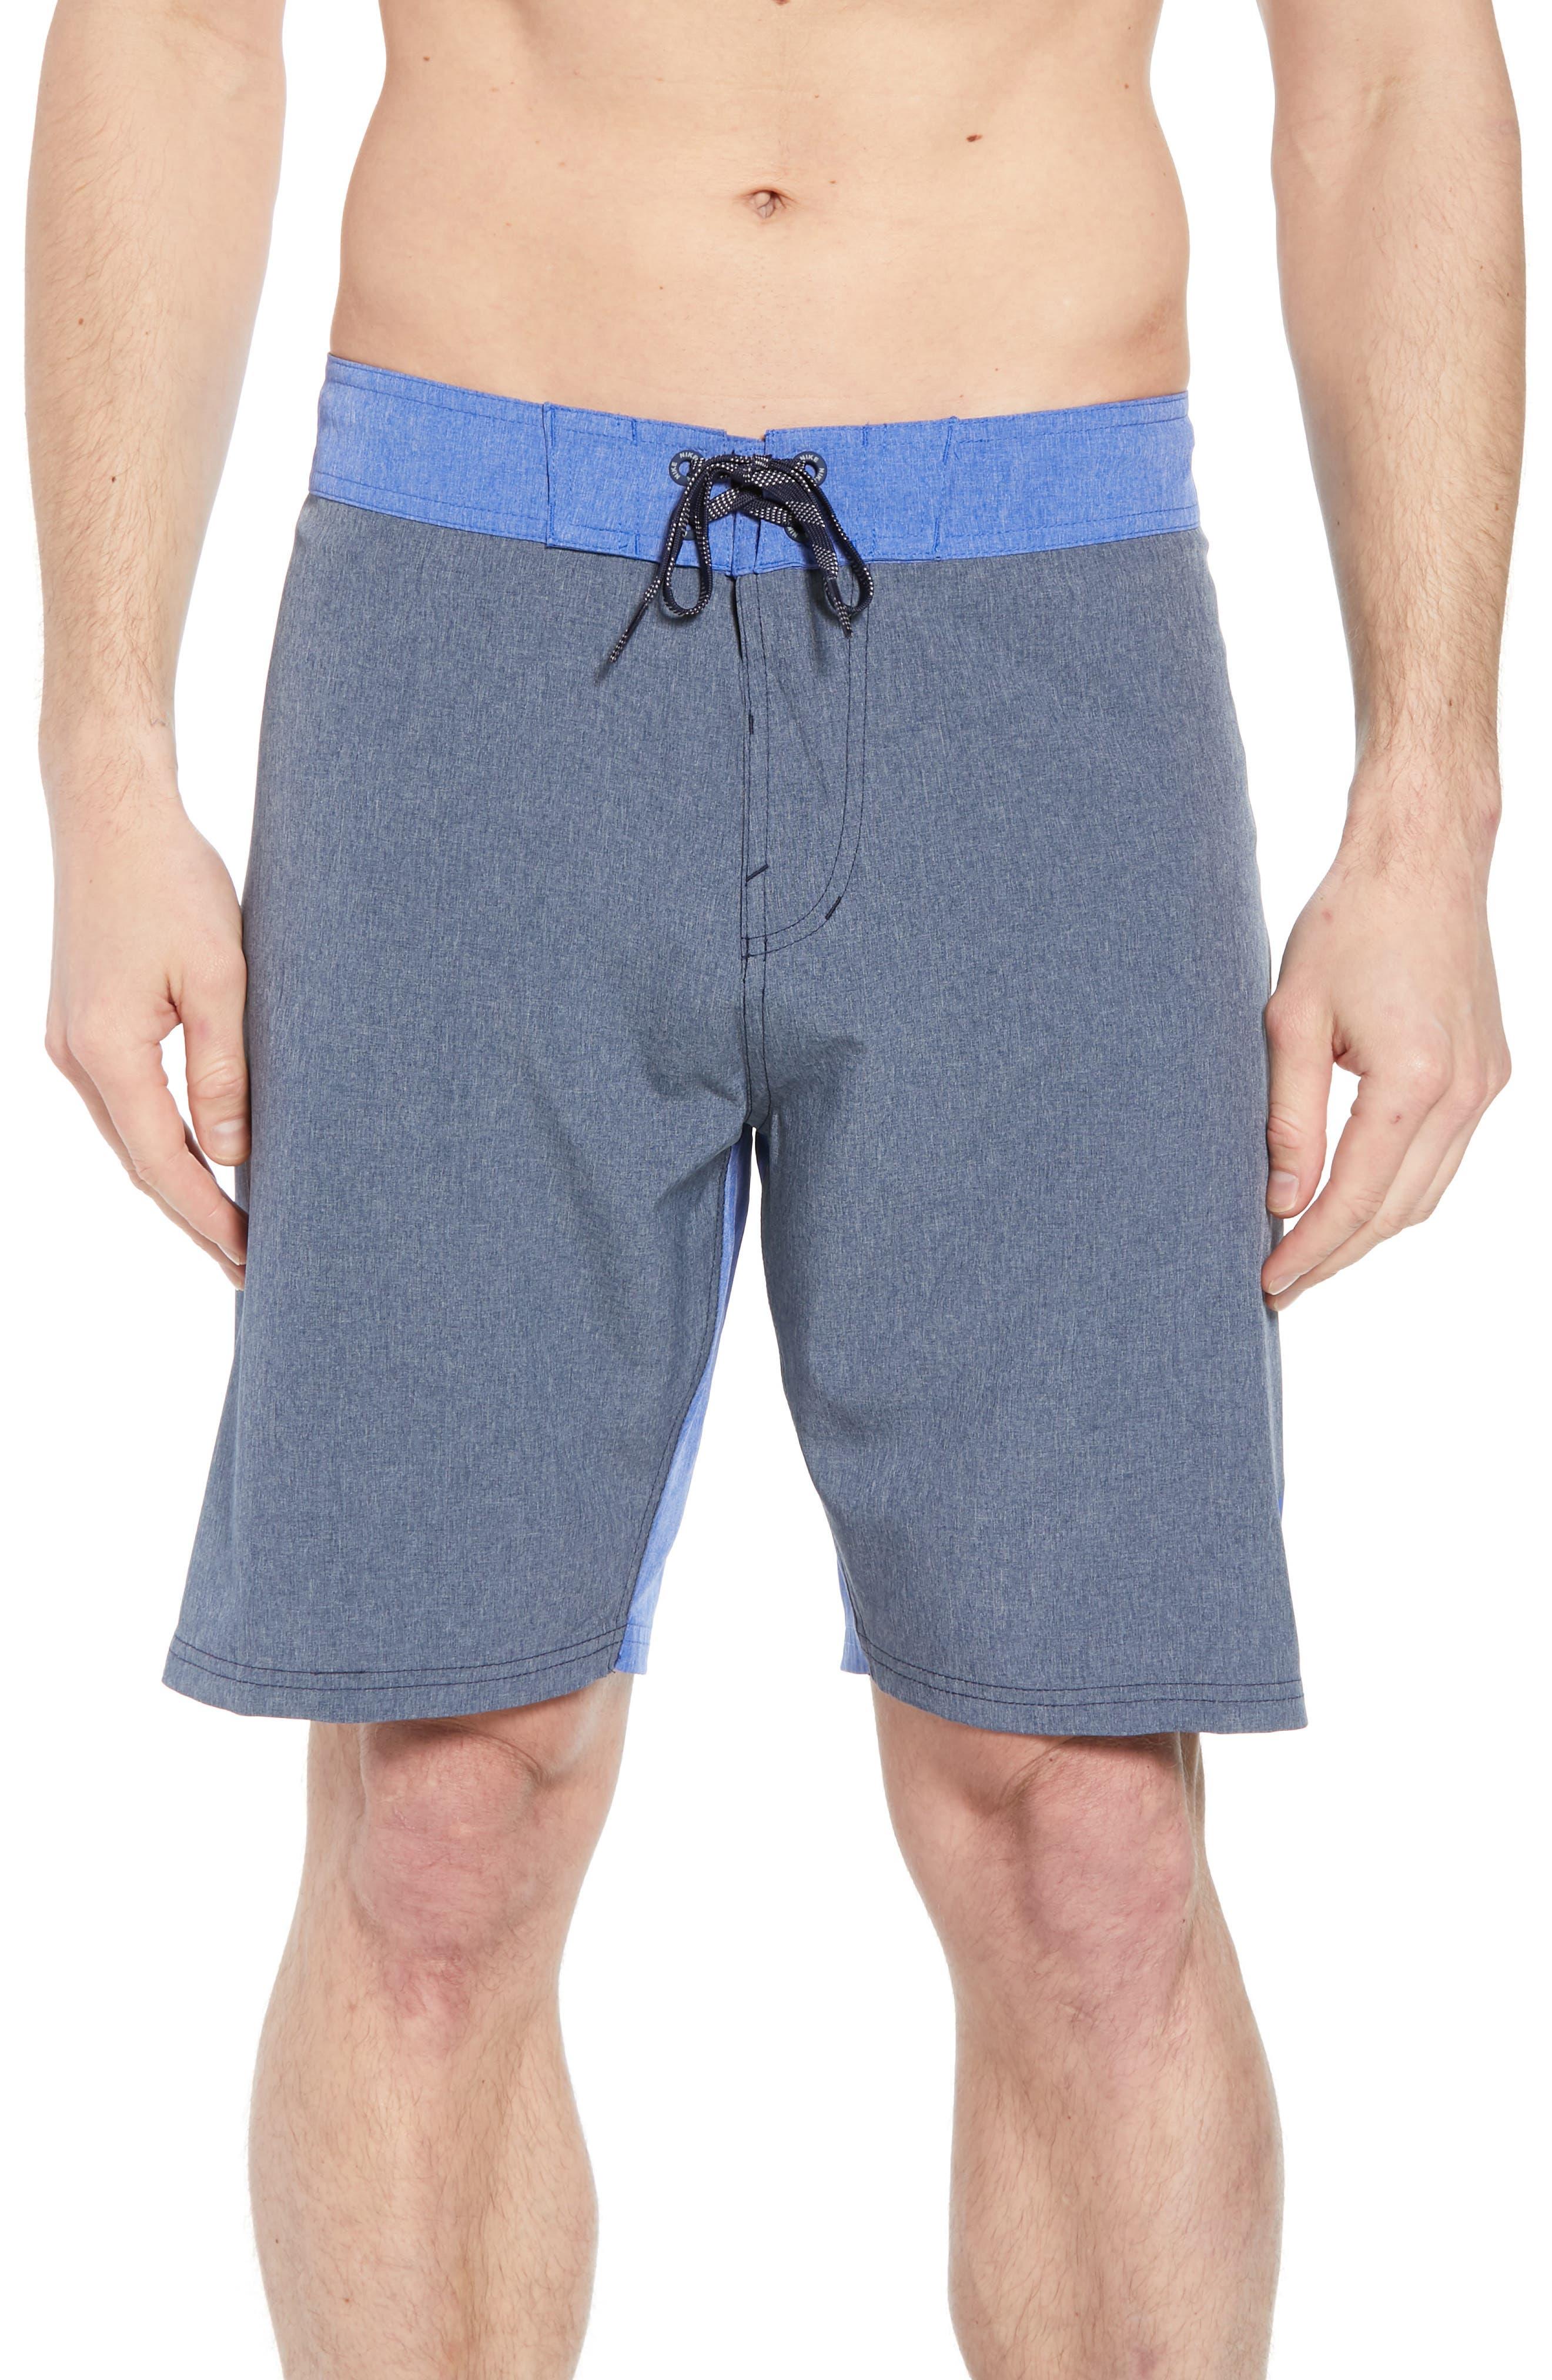 Nike Vortex Board Shorts